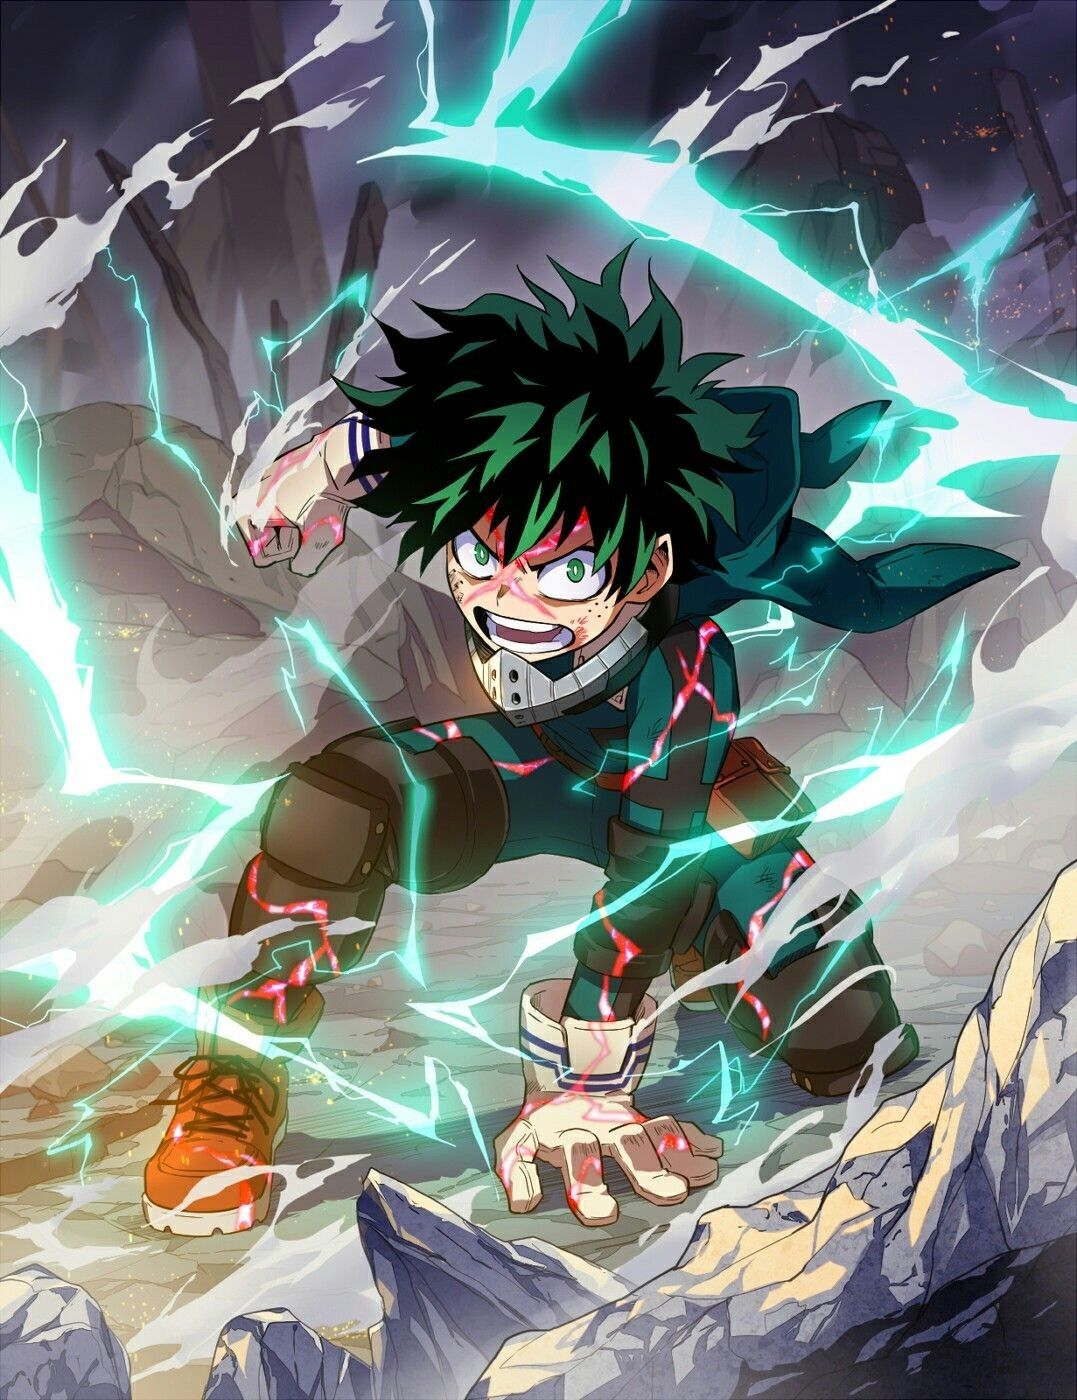 Deku Izuku Midoriya Quirk One For All Anime Anime Guys Hero Wallpaper